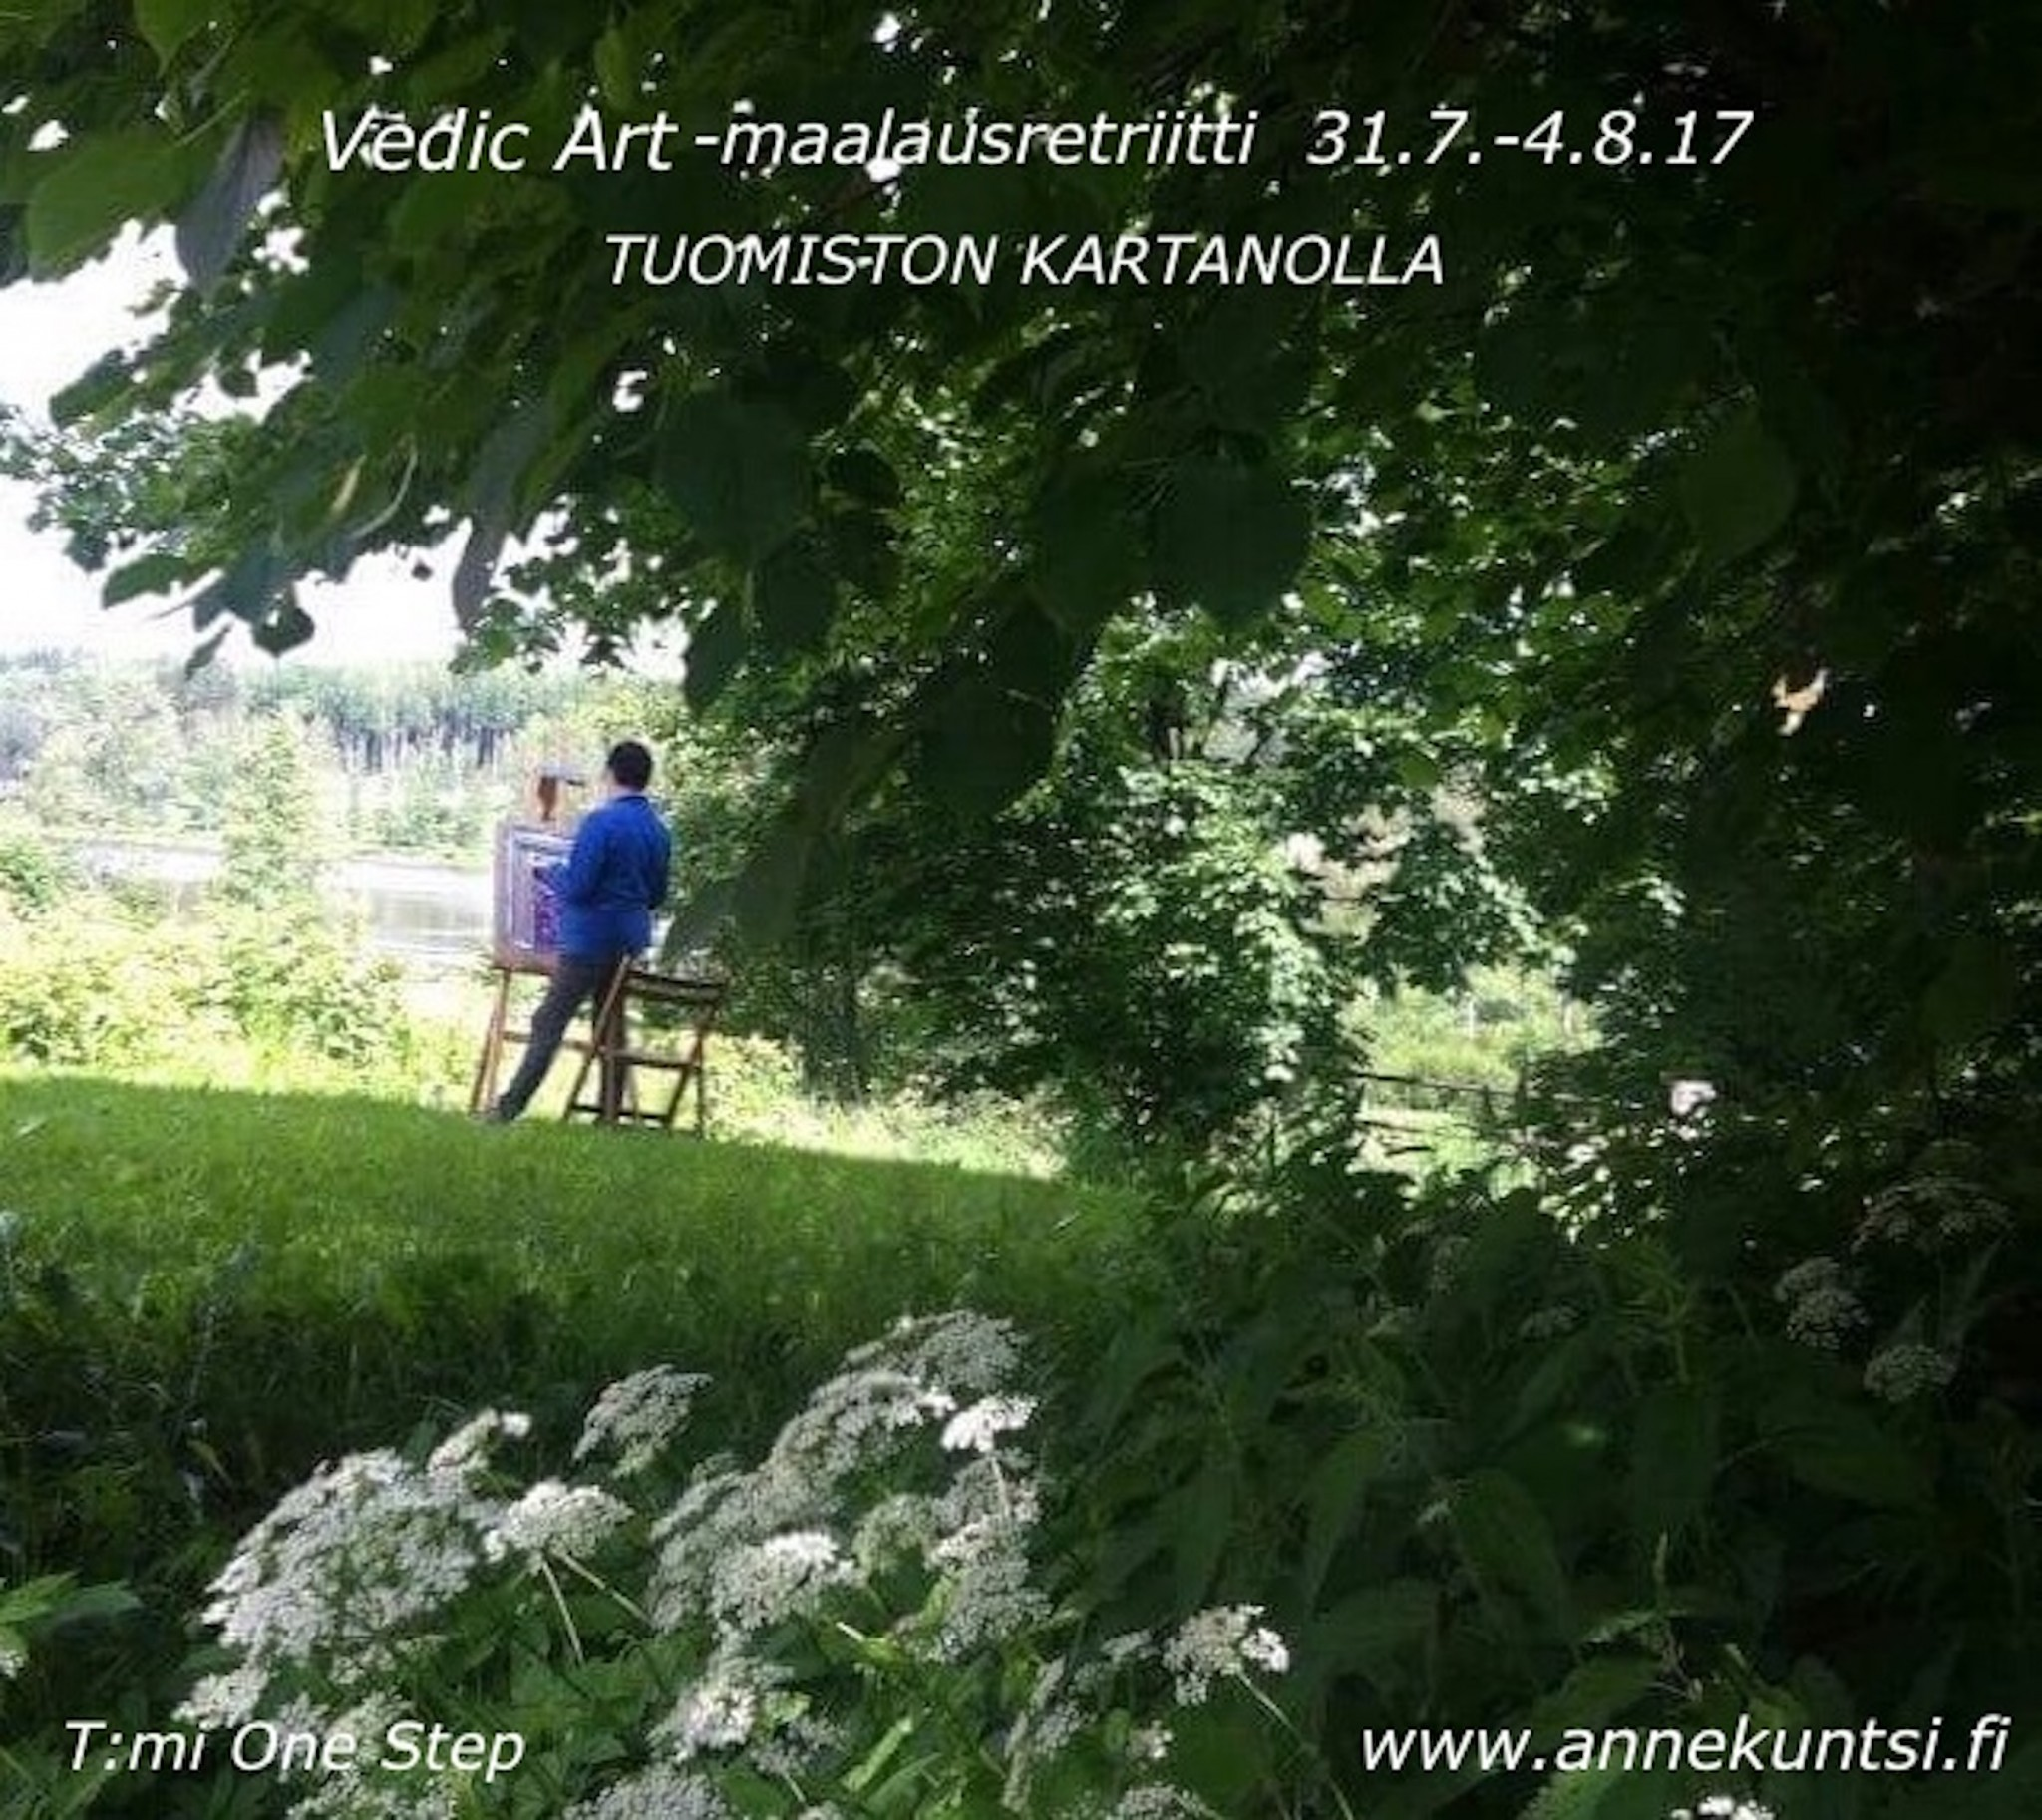 vedic-art-maalausretriitti-2017.jpg